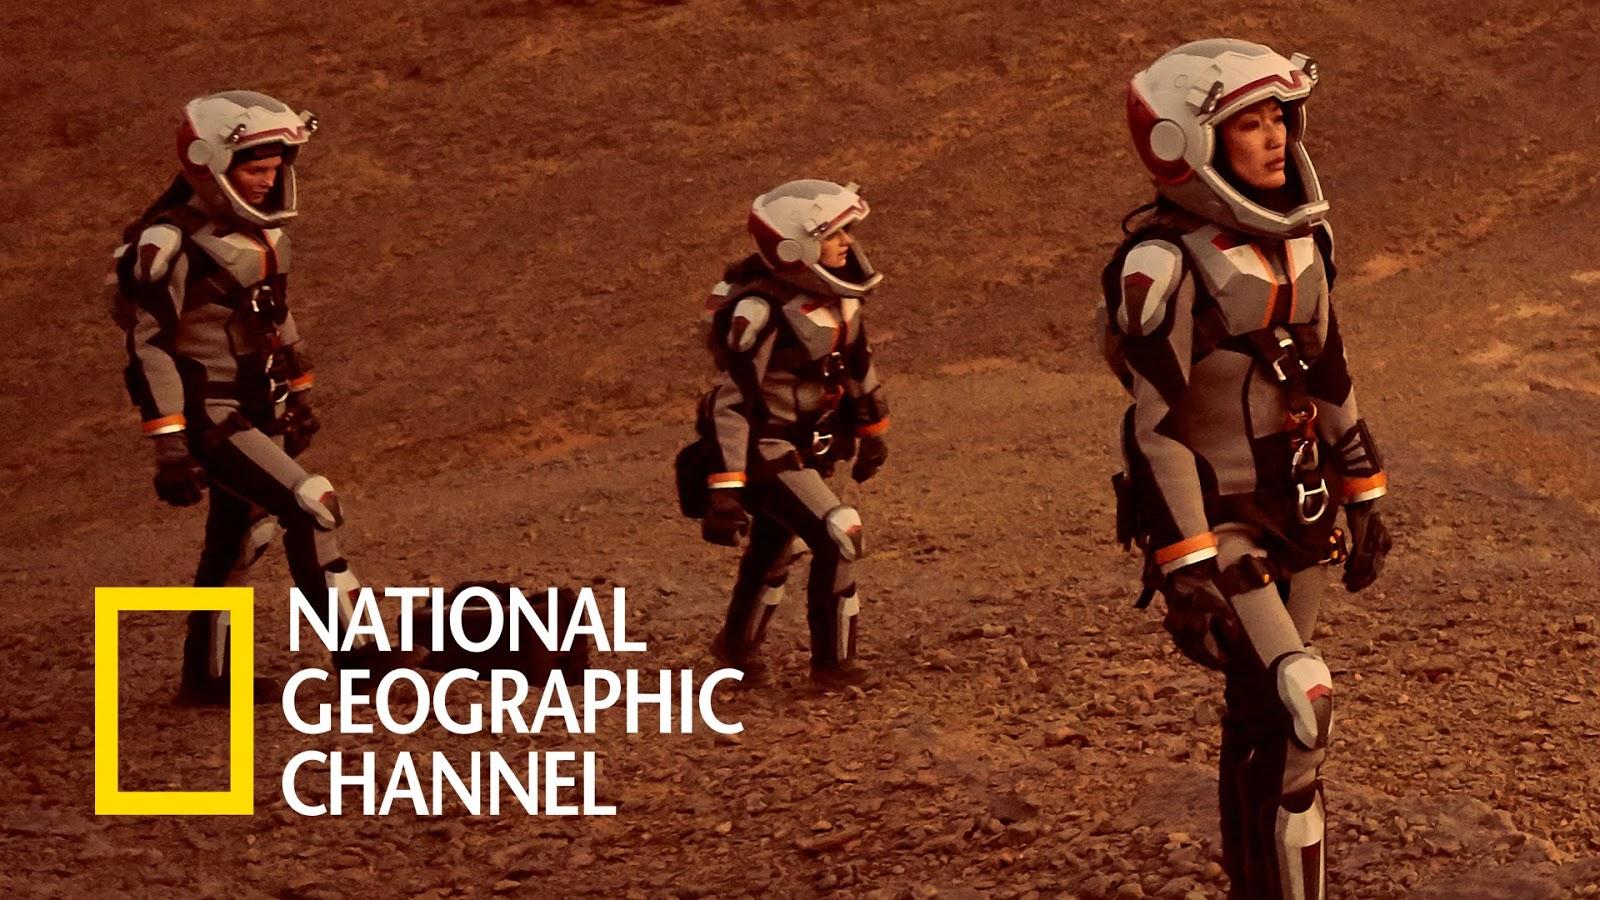 Mars Novo Mundo